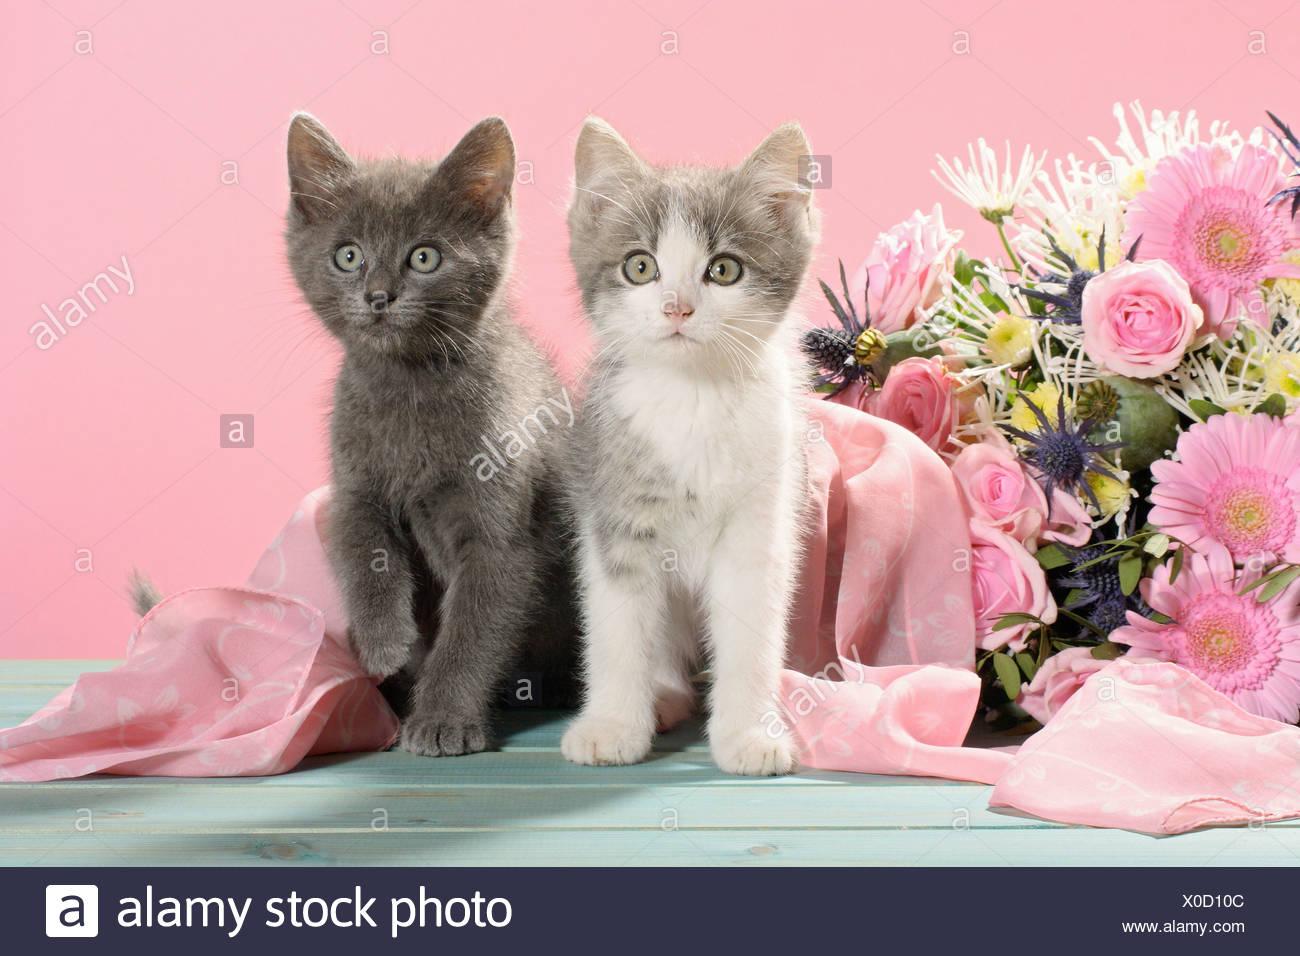 Cat Pink Rose Flower Stock Photos & Cat Pink Rose Flower Stock ...